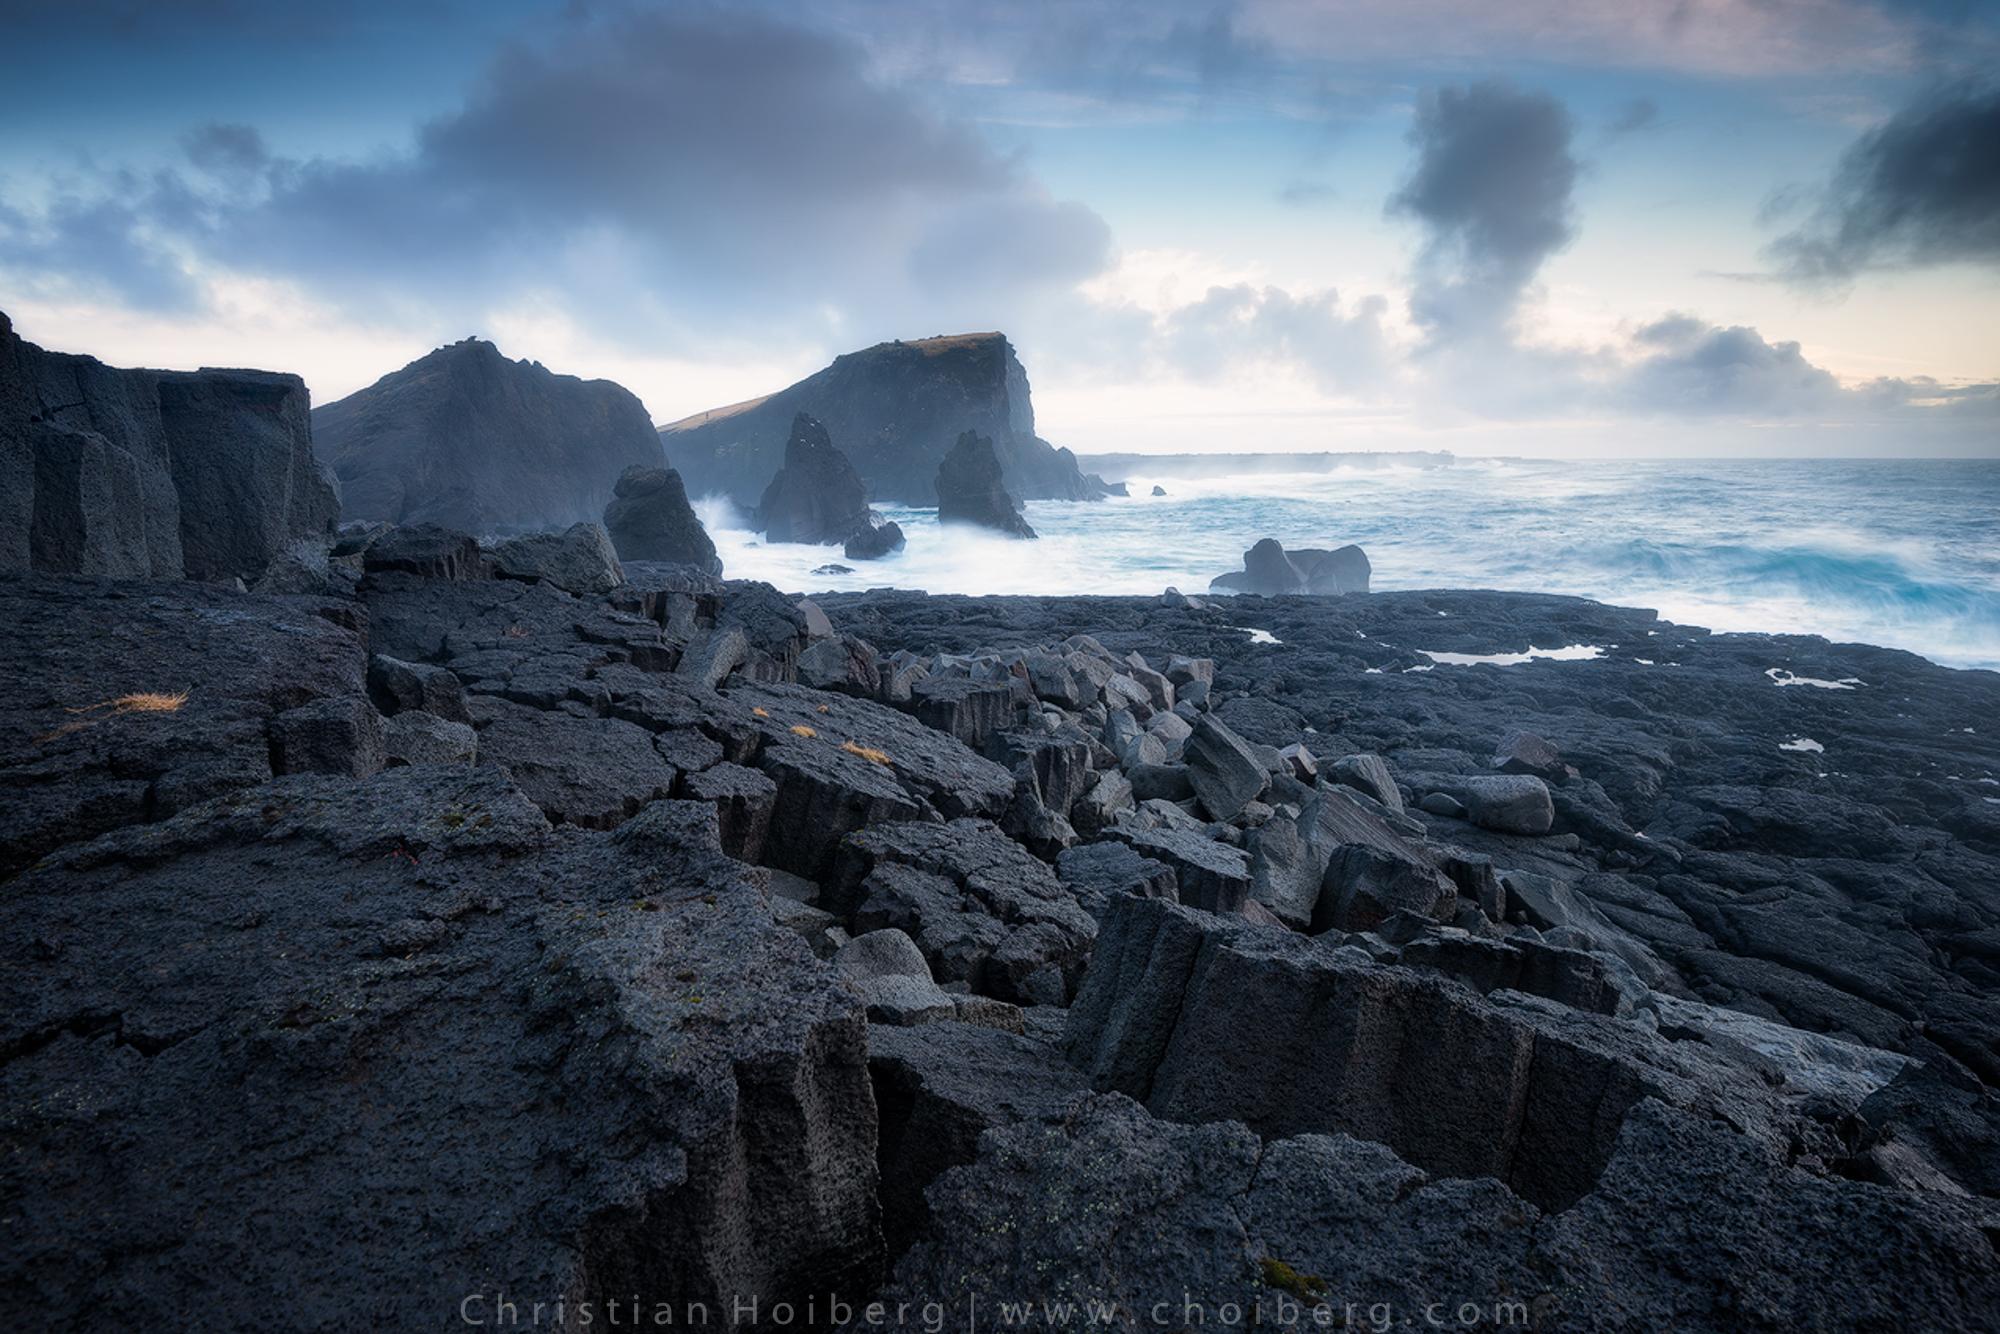 Rugged landscape at the Reykjanes Peninsula